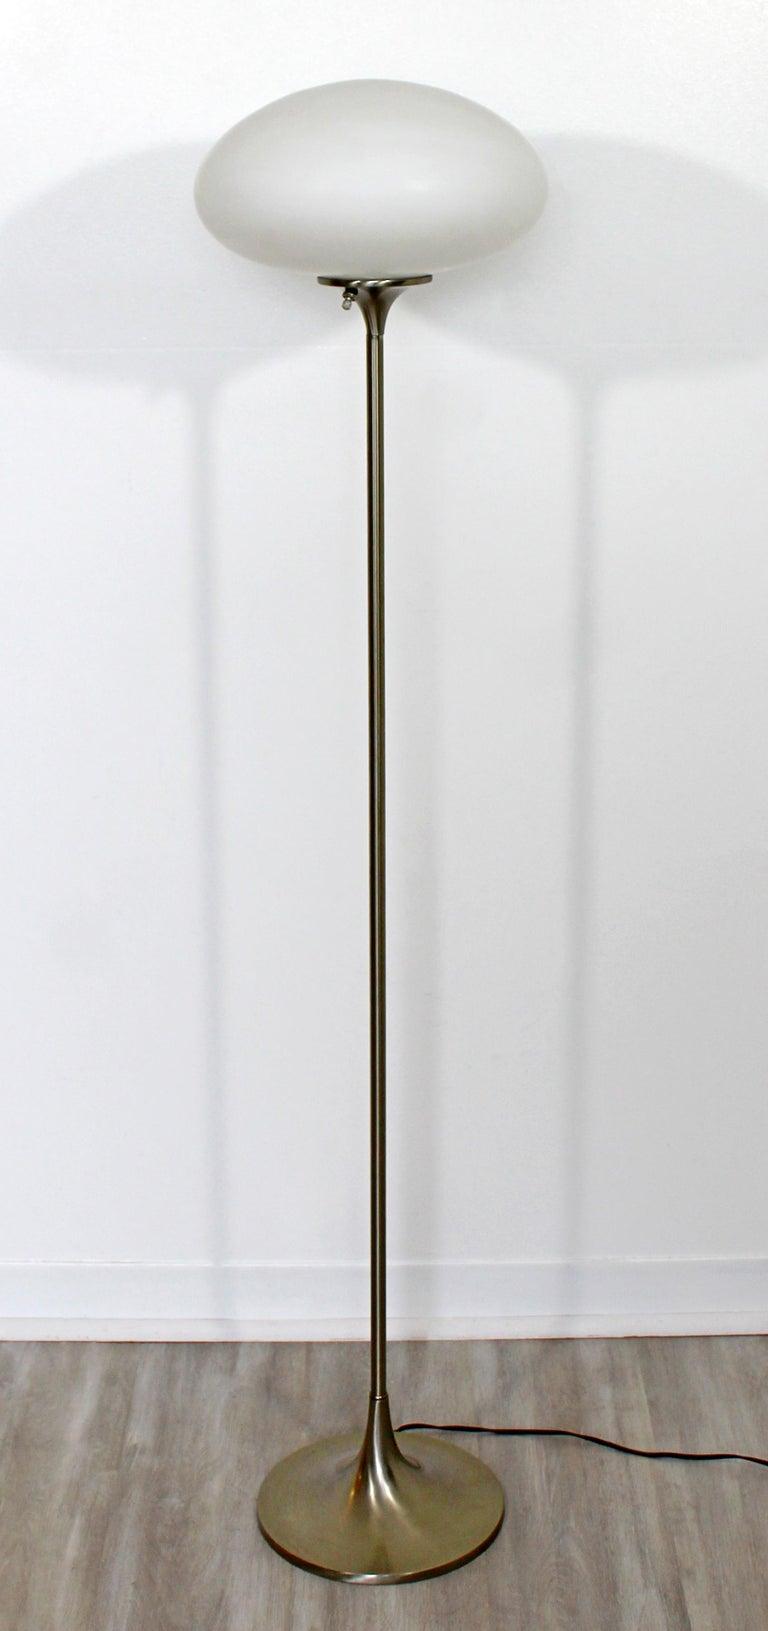 Mid-Century Modern Brushed Steel Glass Mushroom Standing Floor Lamp Laurel 1970s In Good Condition For Sale In Keego Harbor, MI